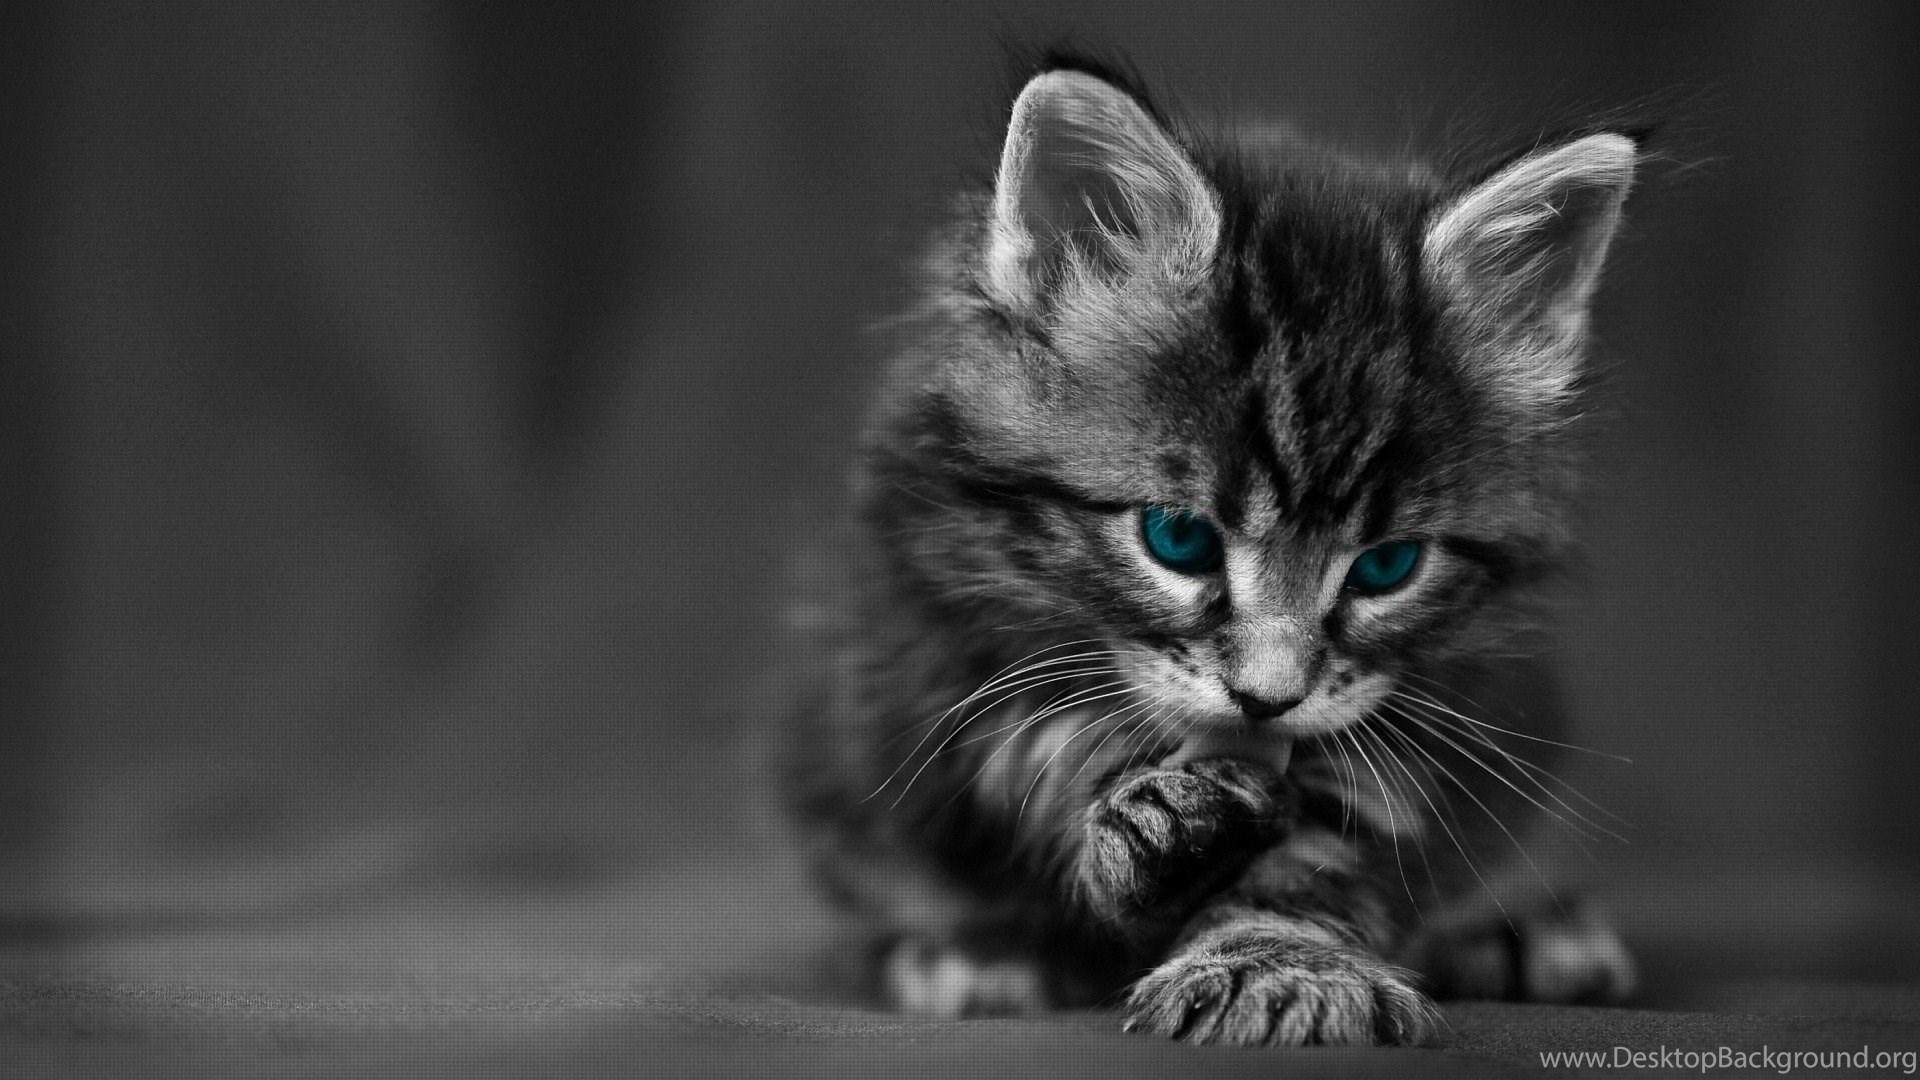 727099 cute black cat hd desktop wallpapers hd desktop wallpaper